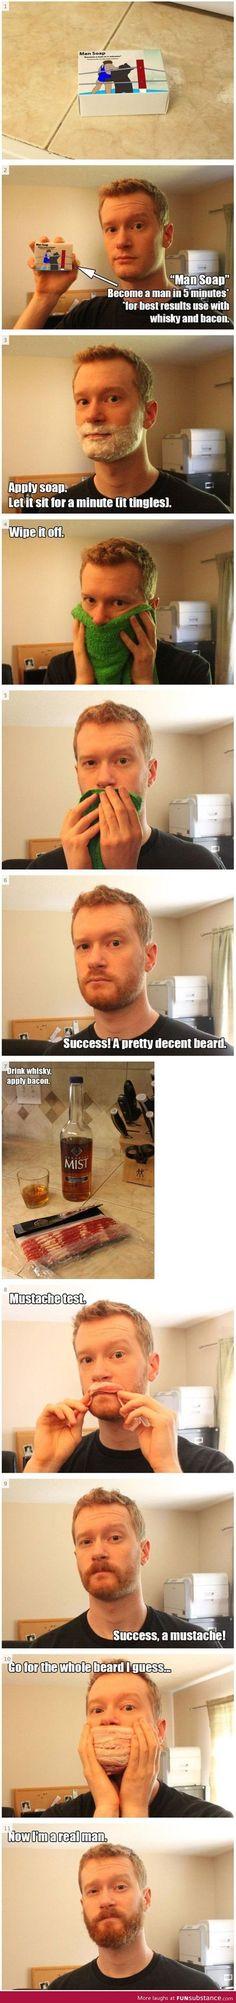 How to become a real man - FunSubstance.com